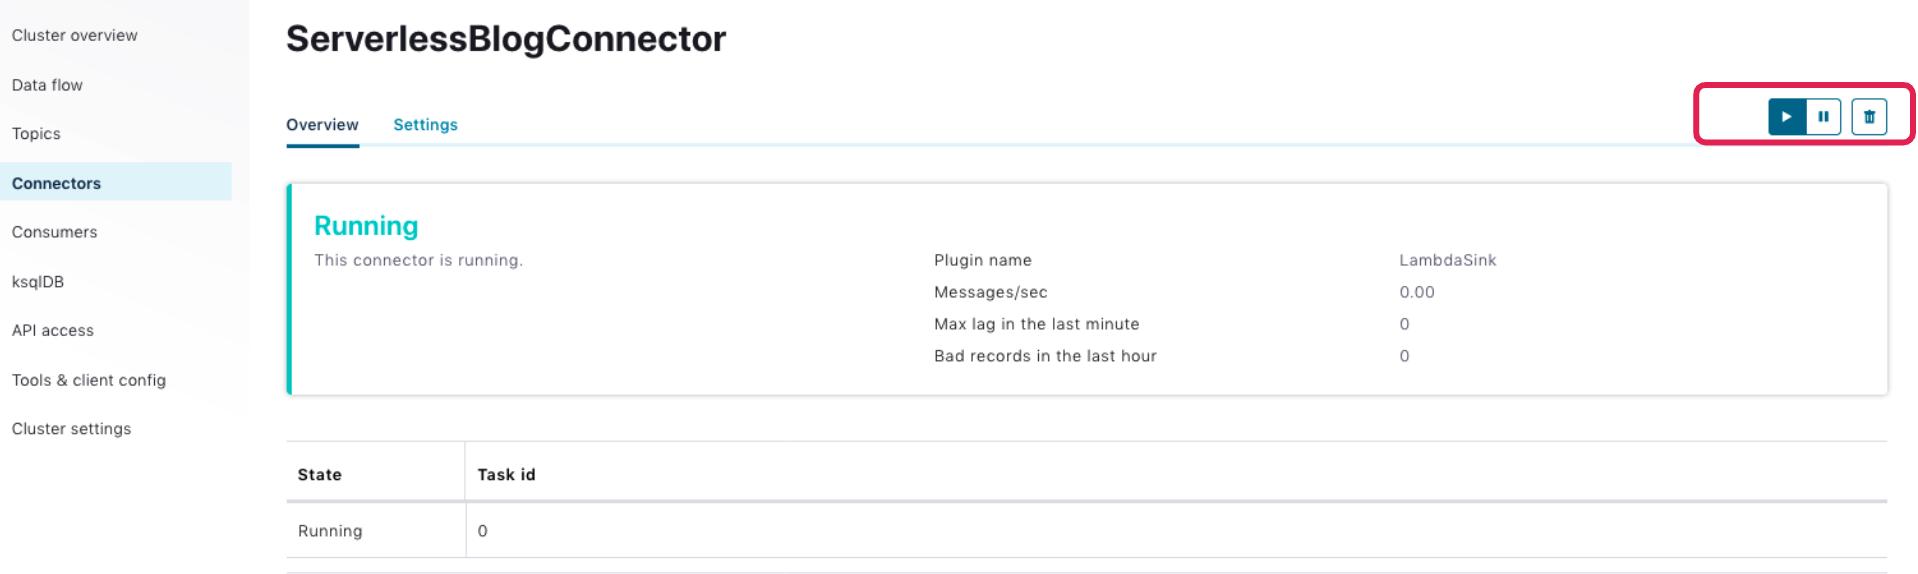 ServerlessBlogConnector | Overview | Running